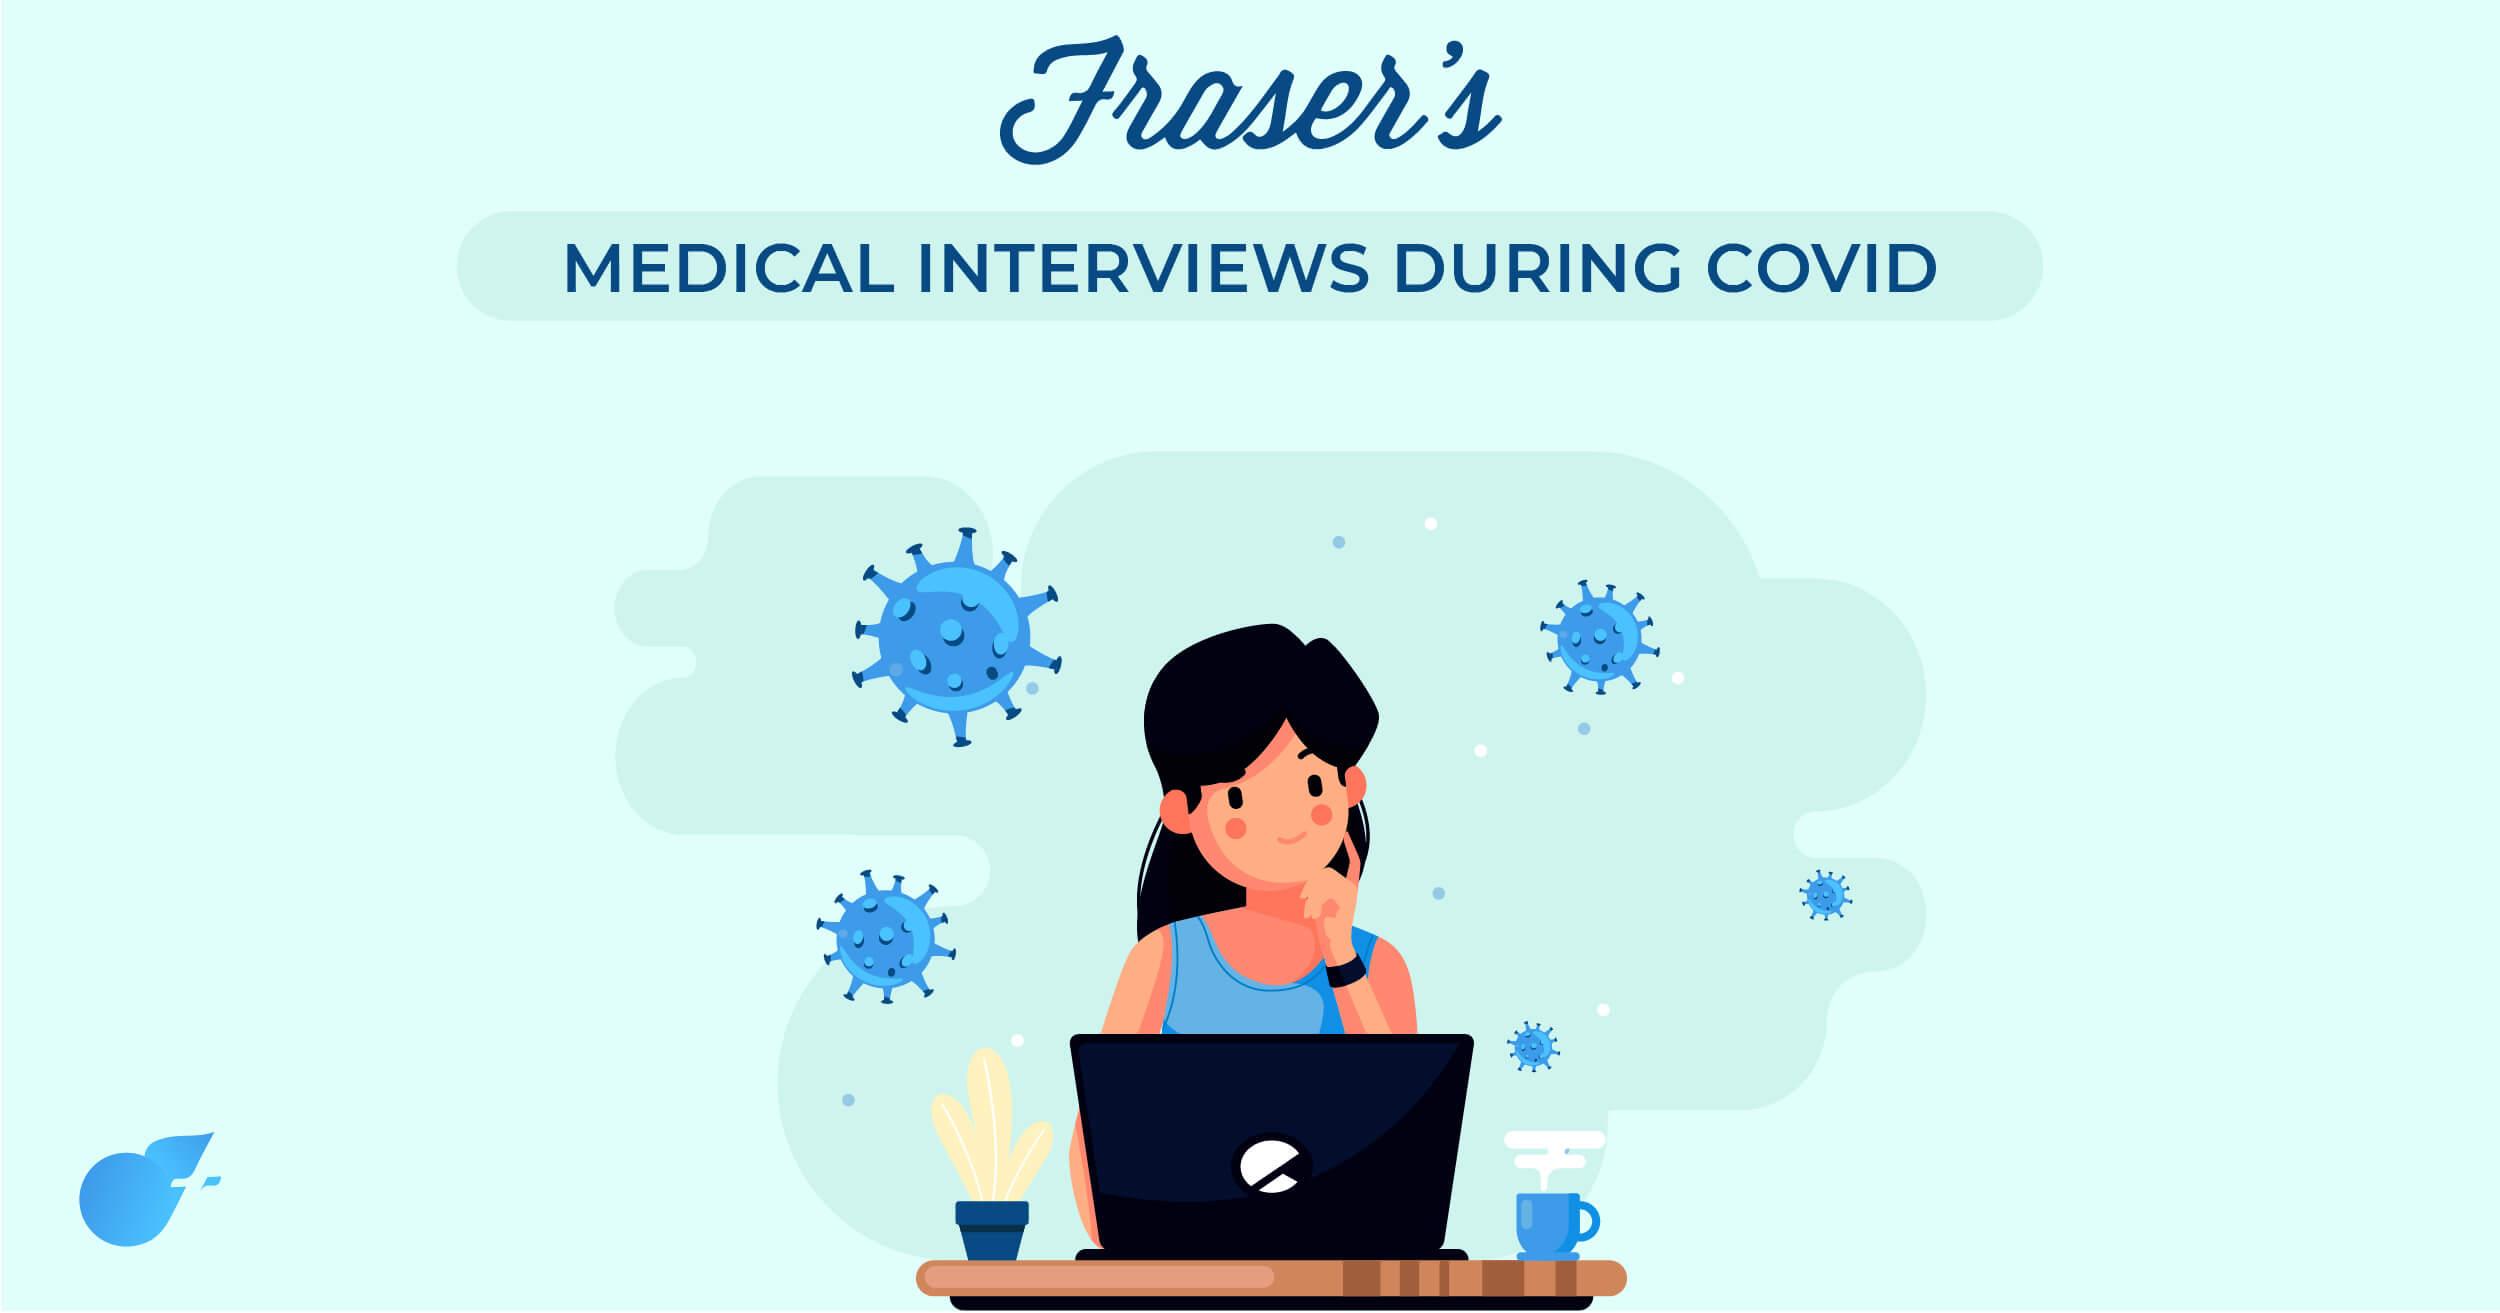 medical interviews during covid (virtual medical interviews